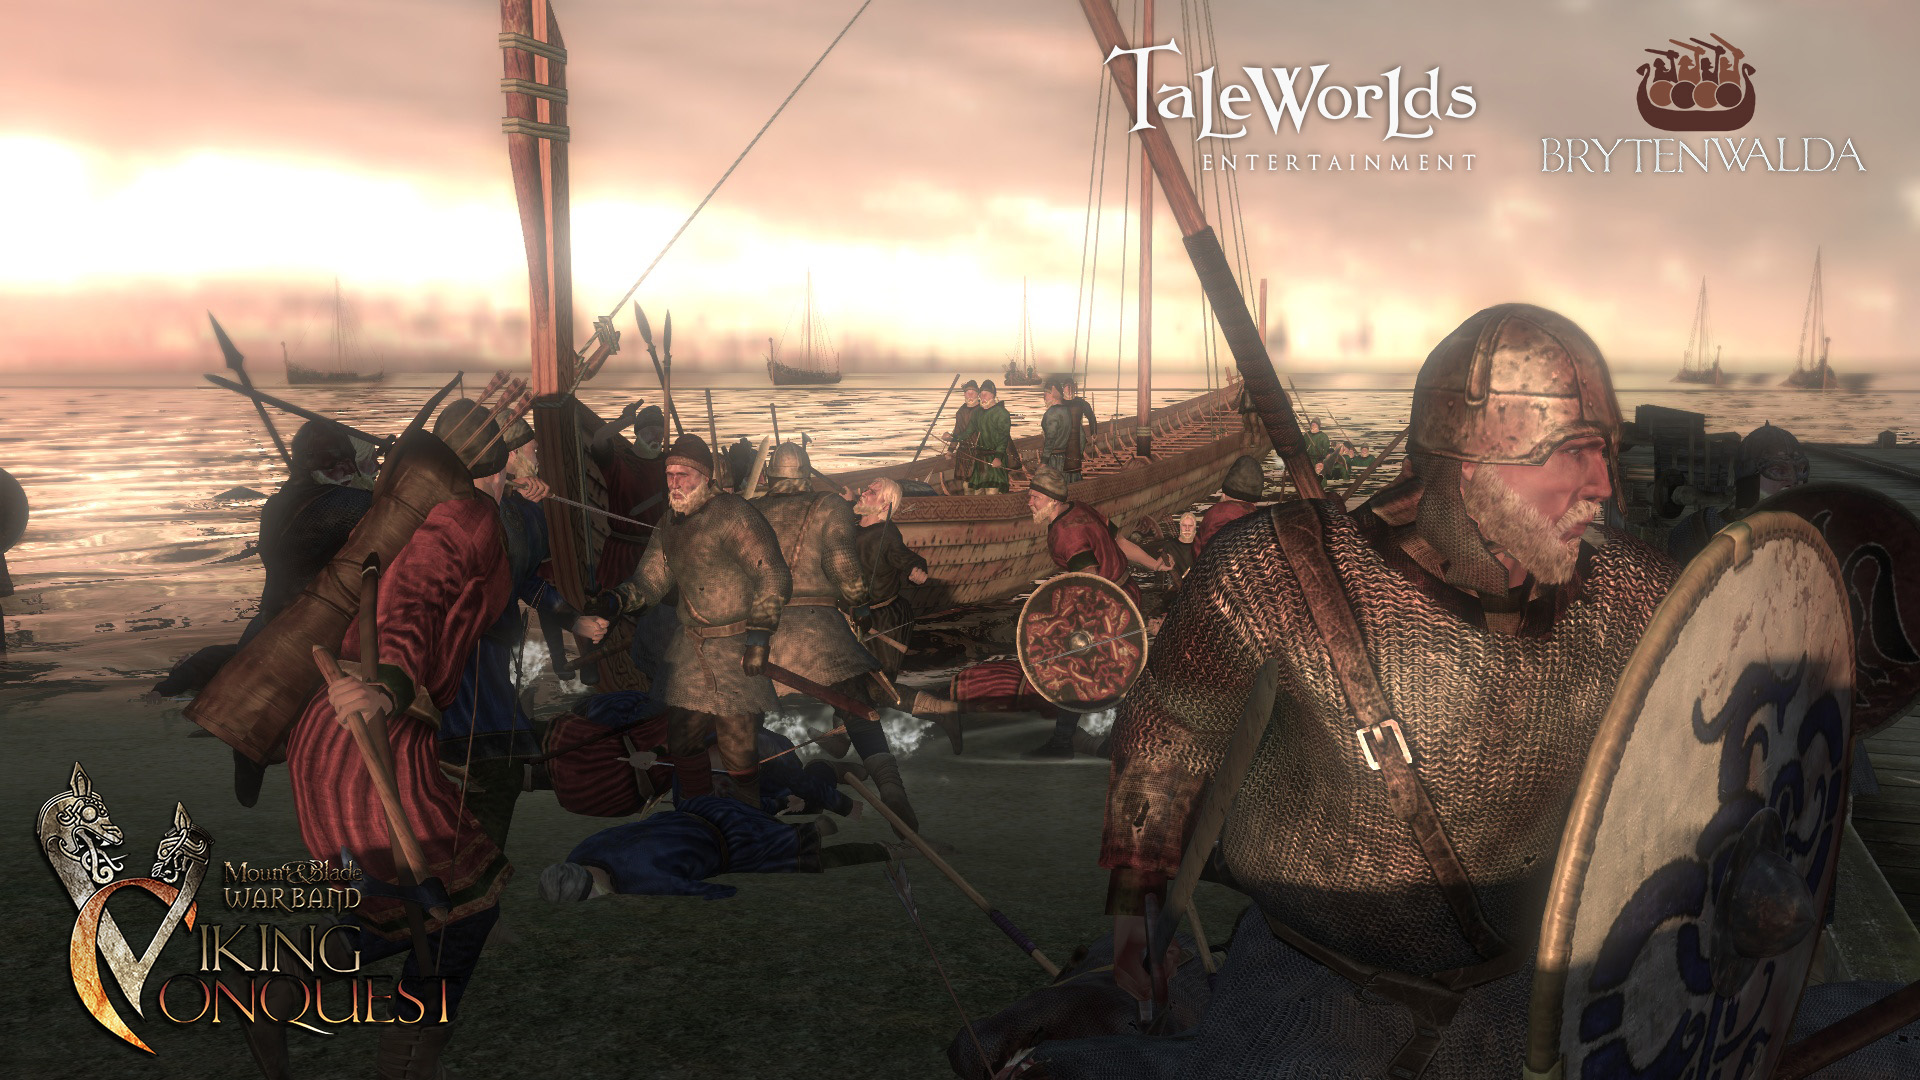 Viking Conquest: discusión general - Página 5 A4b8a0b856526eabfd4cc92caa51206de3e2e6b2